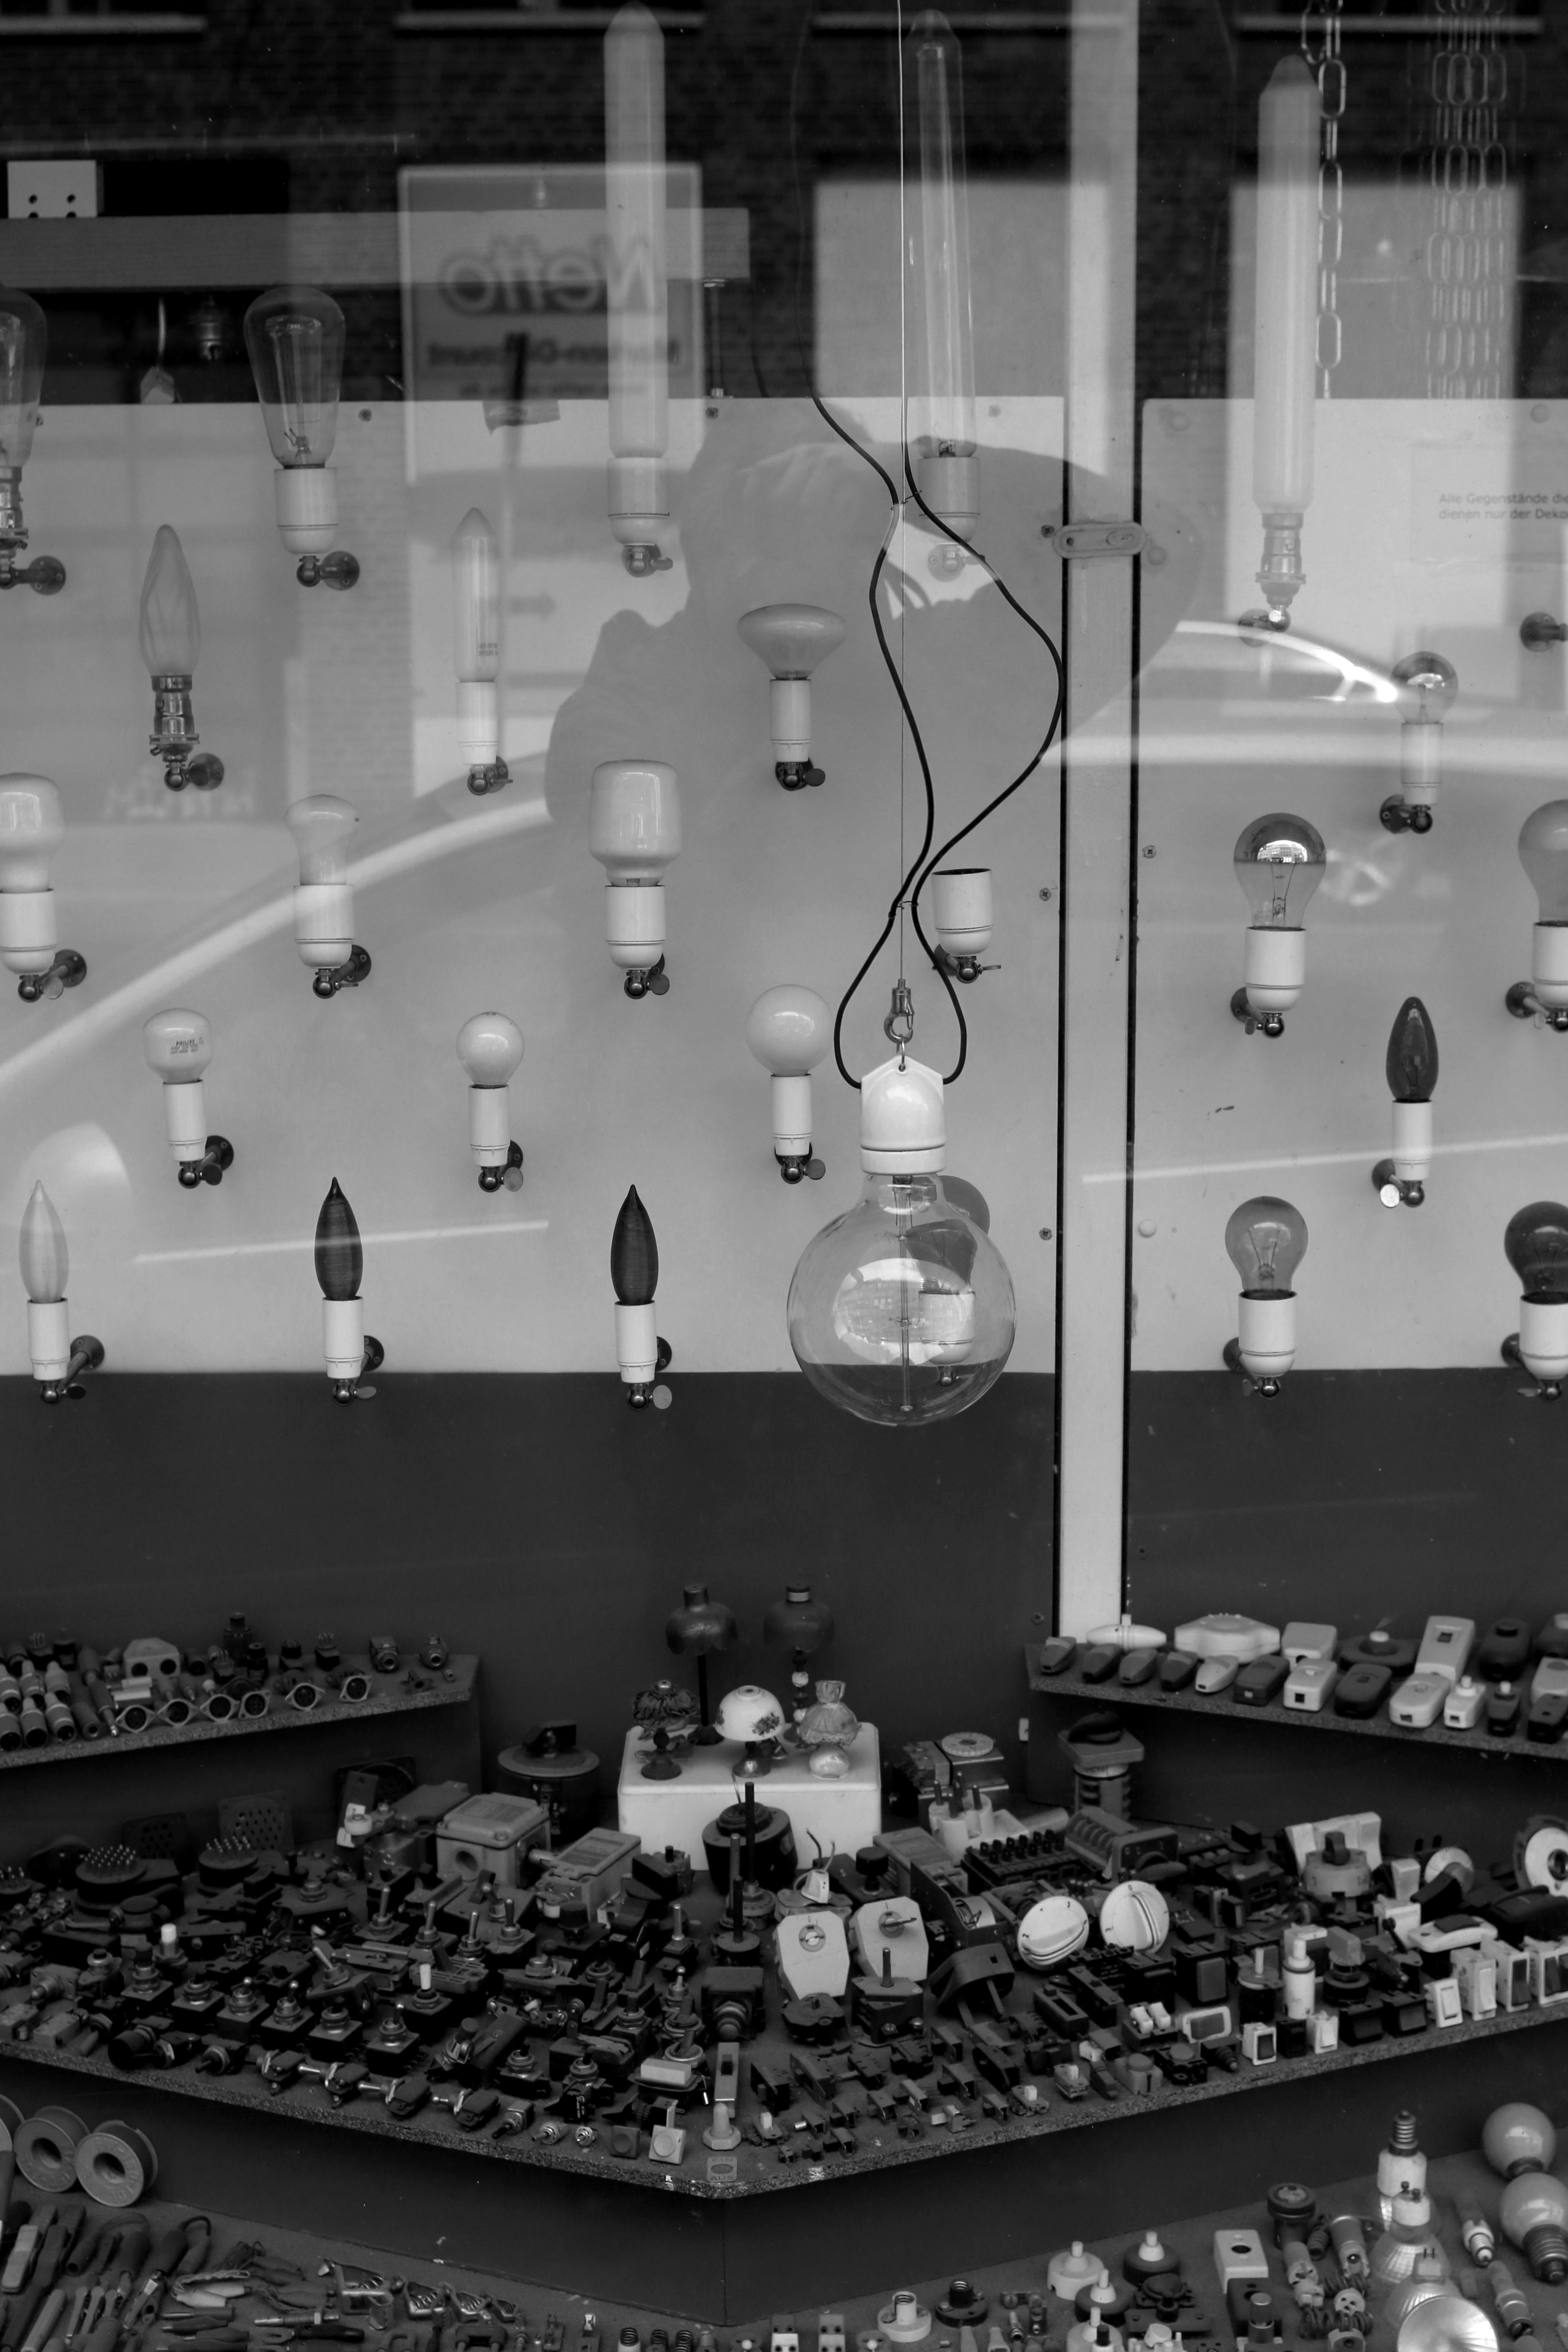 black-and-white-white-photography-bulb-lamp-black-monochrome-lighting-bw-blackandwhite-blackwhite-bulbs-lamps-germany-alemania-allemagne-sw-schwarzweiss-schwarzweis-image-shape-frankfurtmain-frankfurtammain-frankfurtam-frankfurtamain-germania-frankfurt-schwarzweissfotografie-schwarzweisfotografie-electro-lampen-elektrik-elektro-glhbirnen-elektroartikel-elektrobauteile-elektrikbauteile-monochrome-photography-240891 Spannende Lampen Frankfurt Am Main Dekorationen